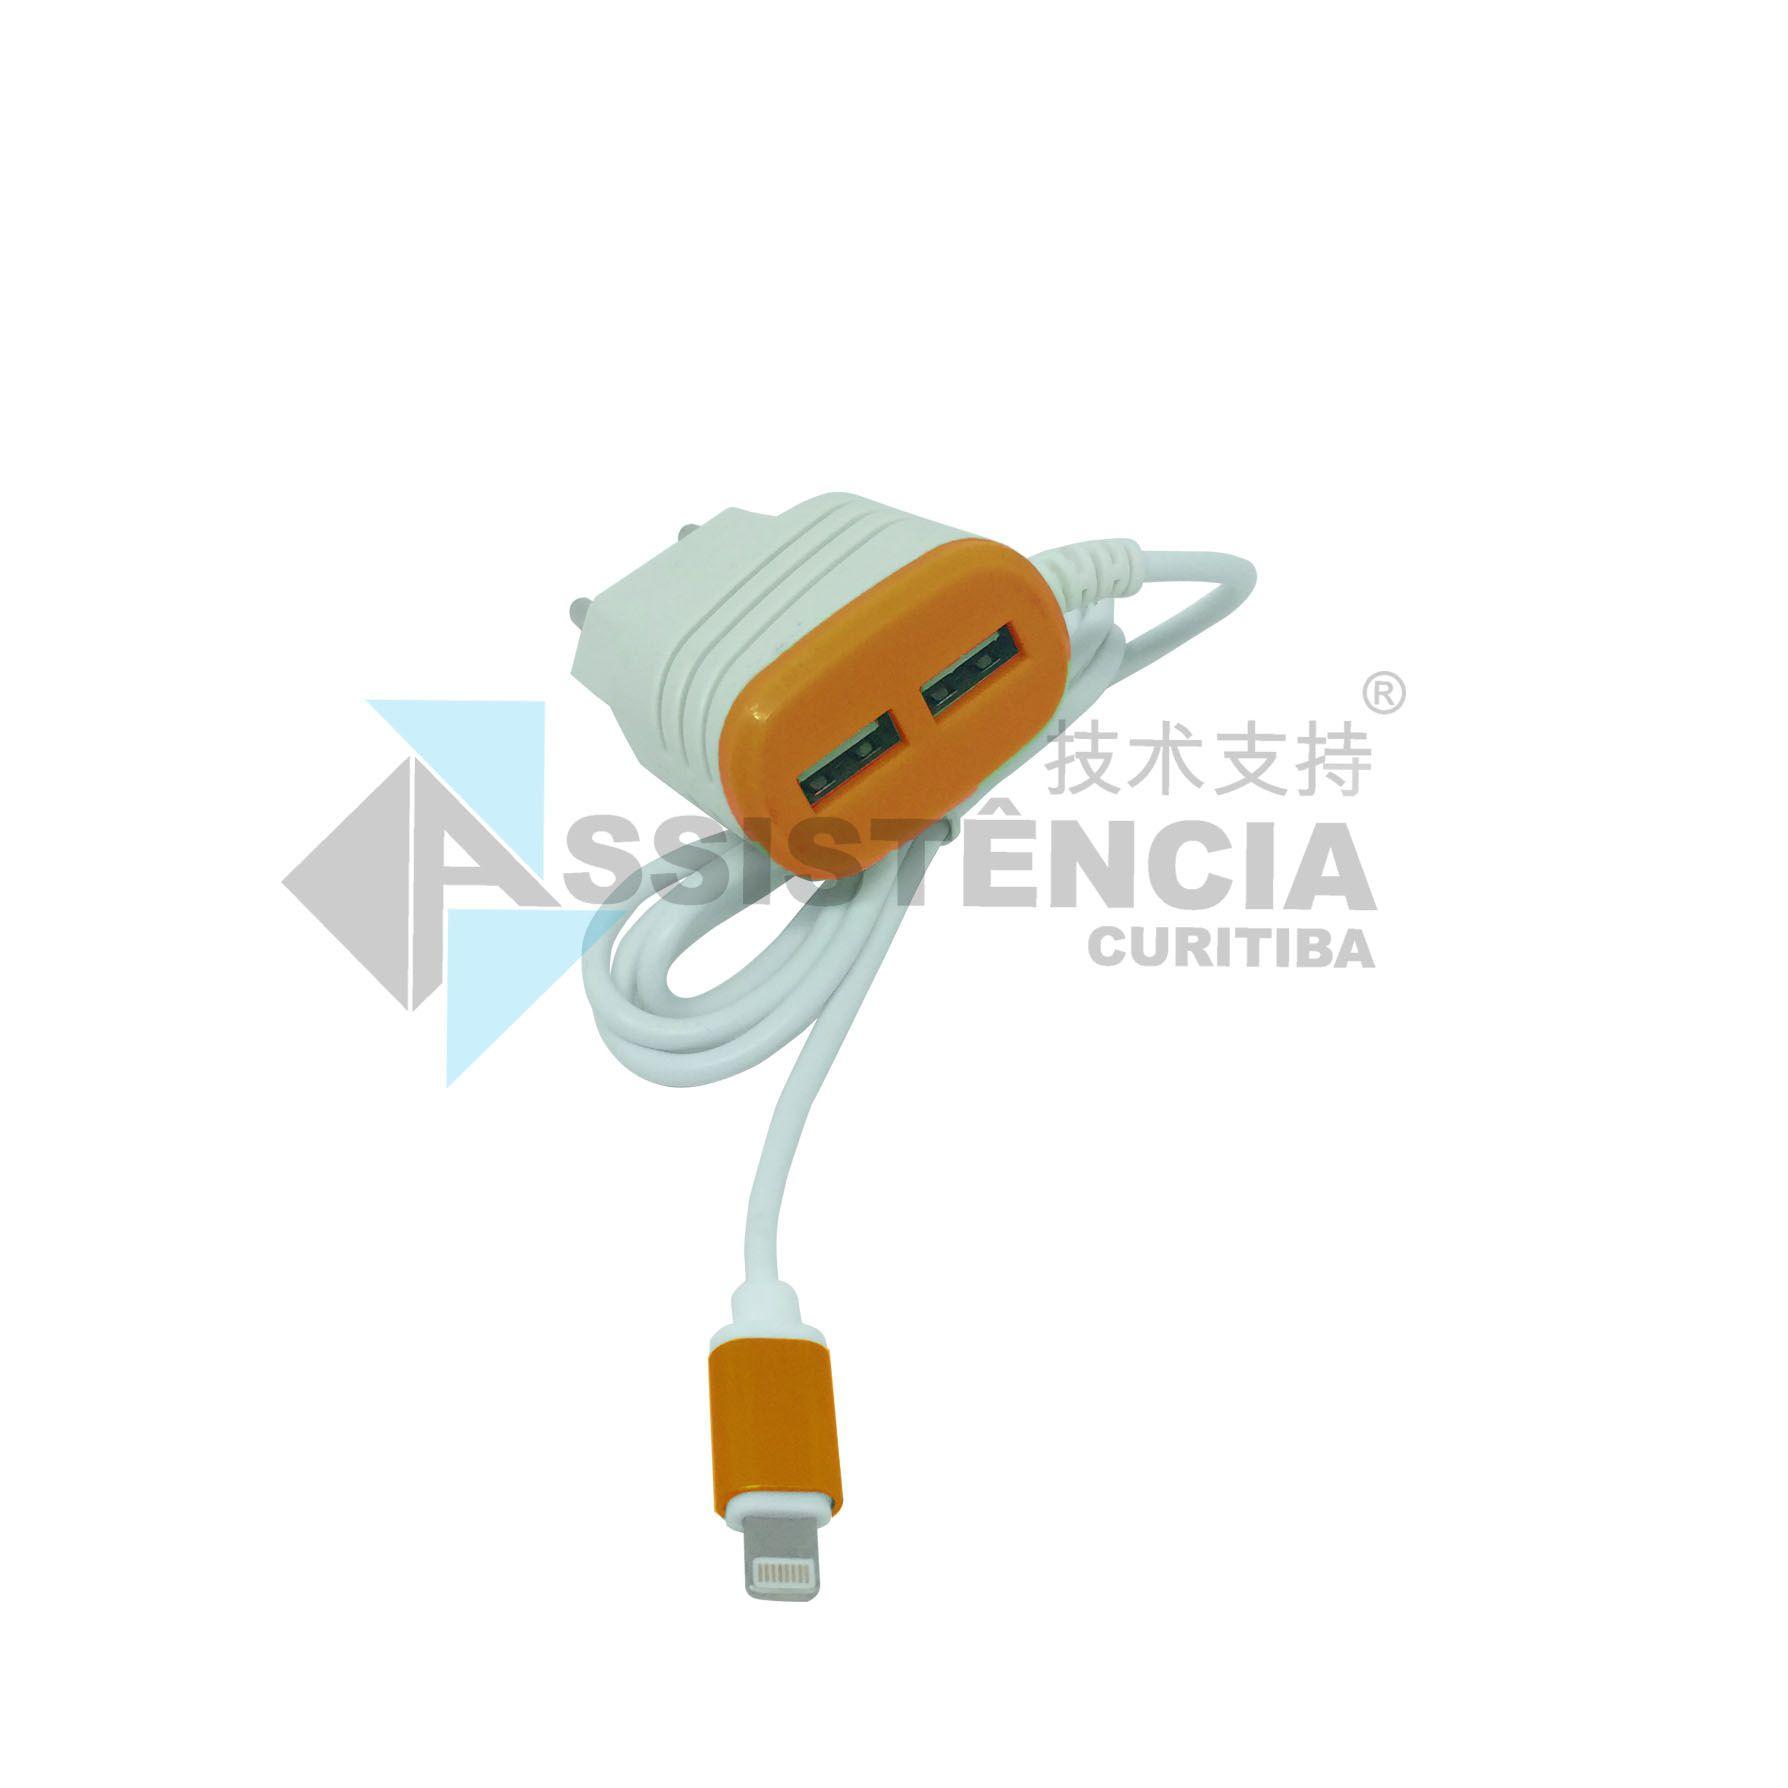 CARREGADOR DE PAREDE SMART 3.1A PARA IPHONE